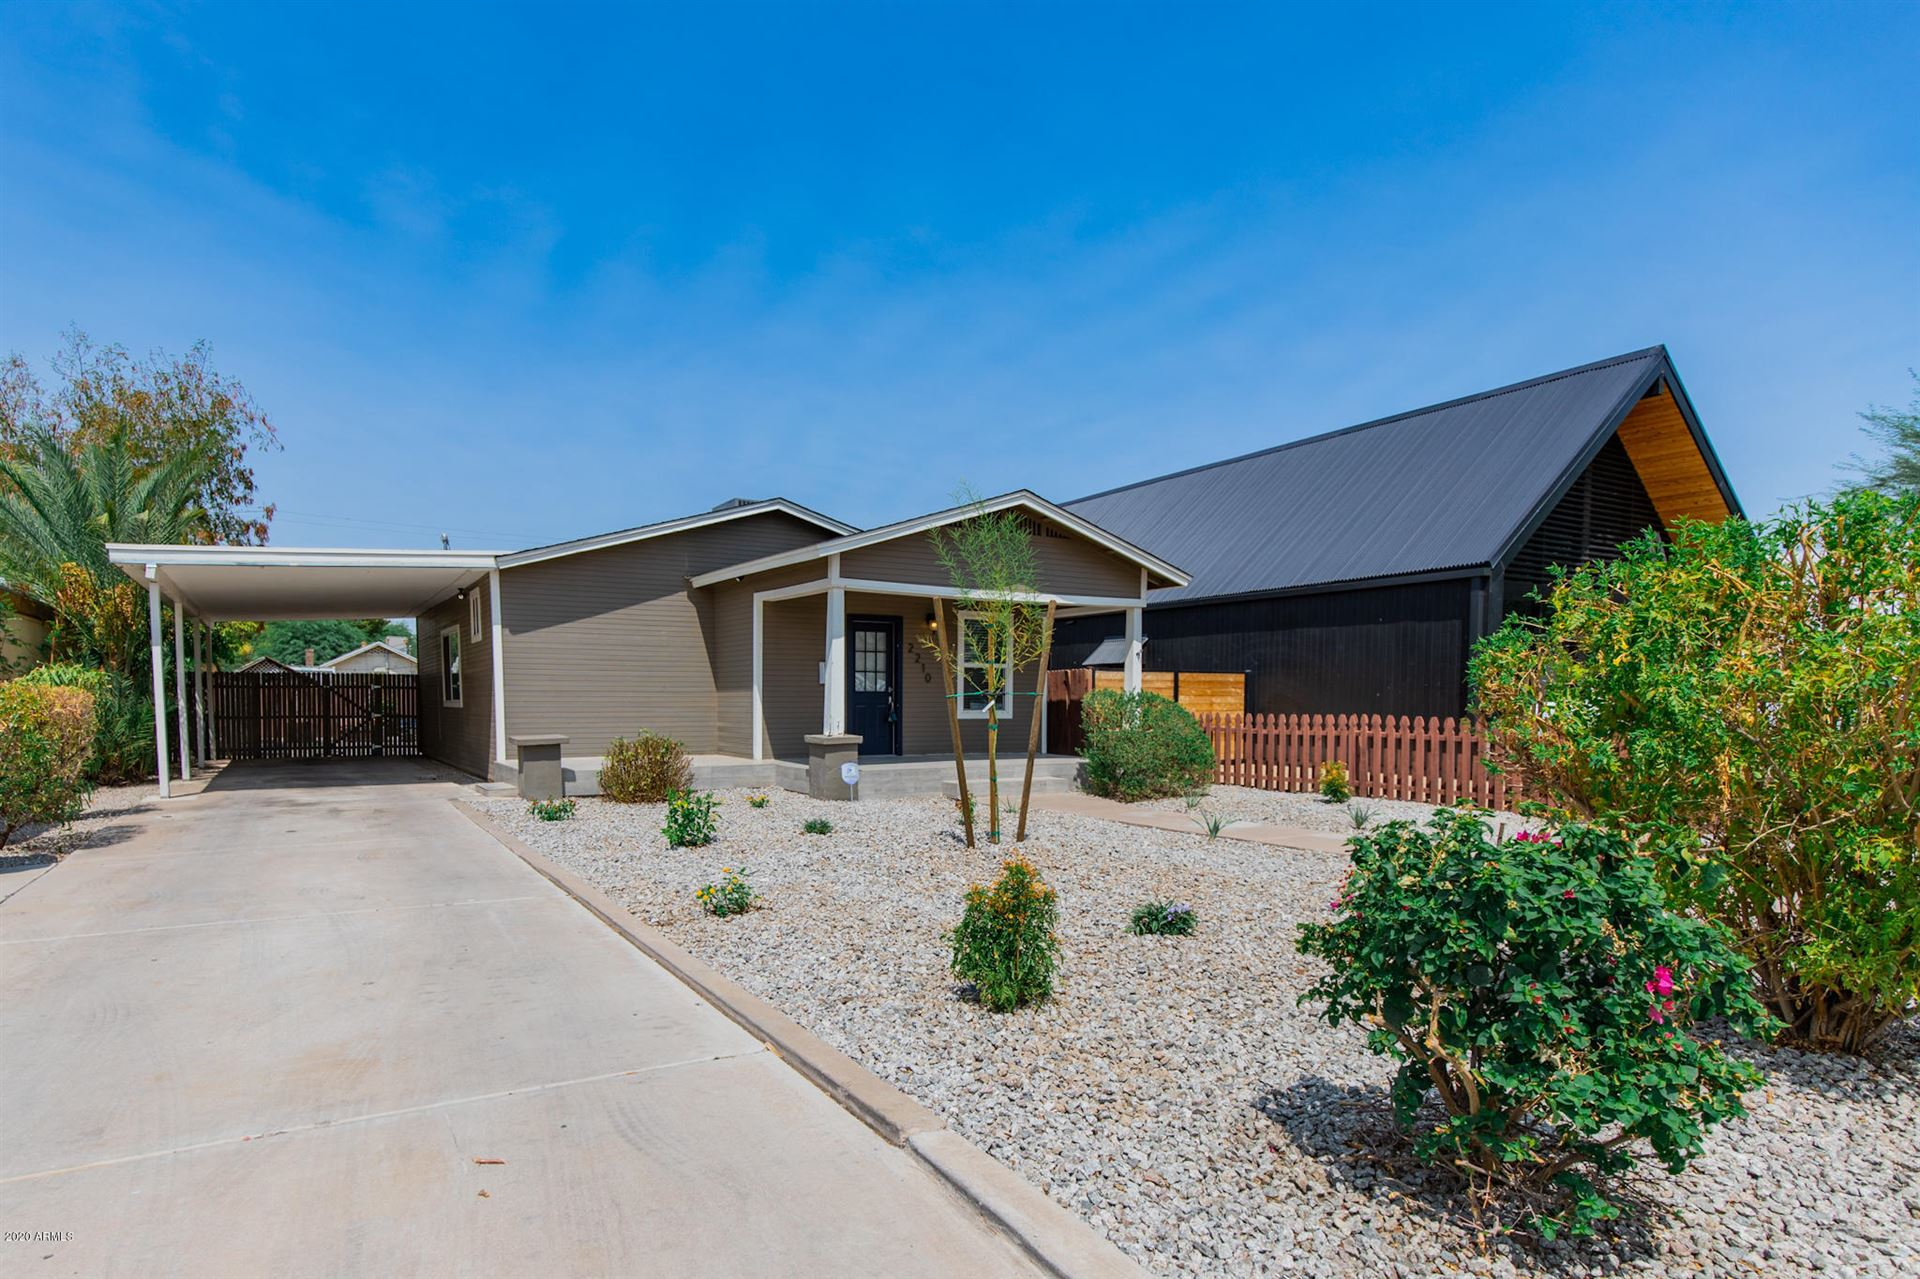 2210 N DAYTON Street, Phoenix, AZ 85006 - MLS#: 6083655